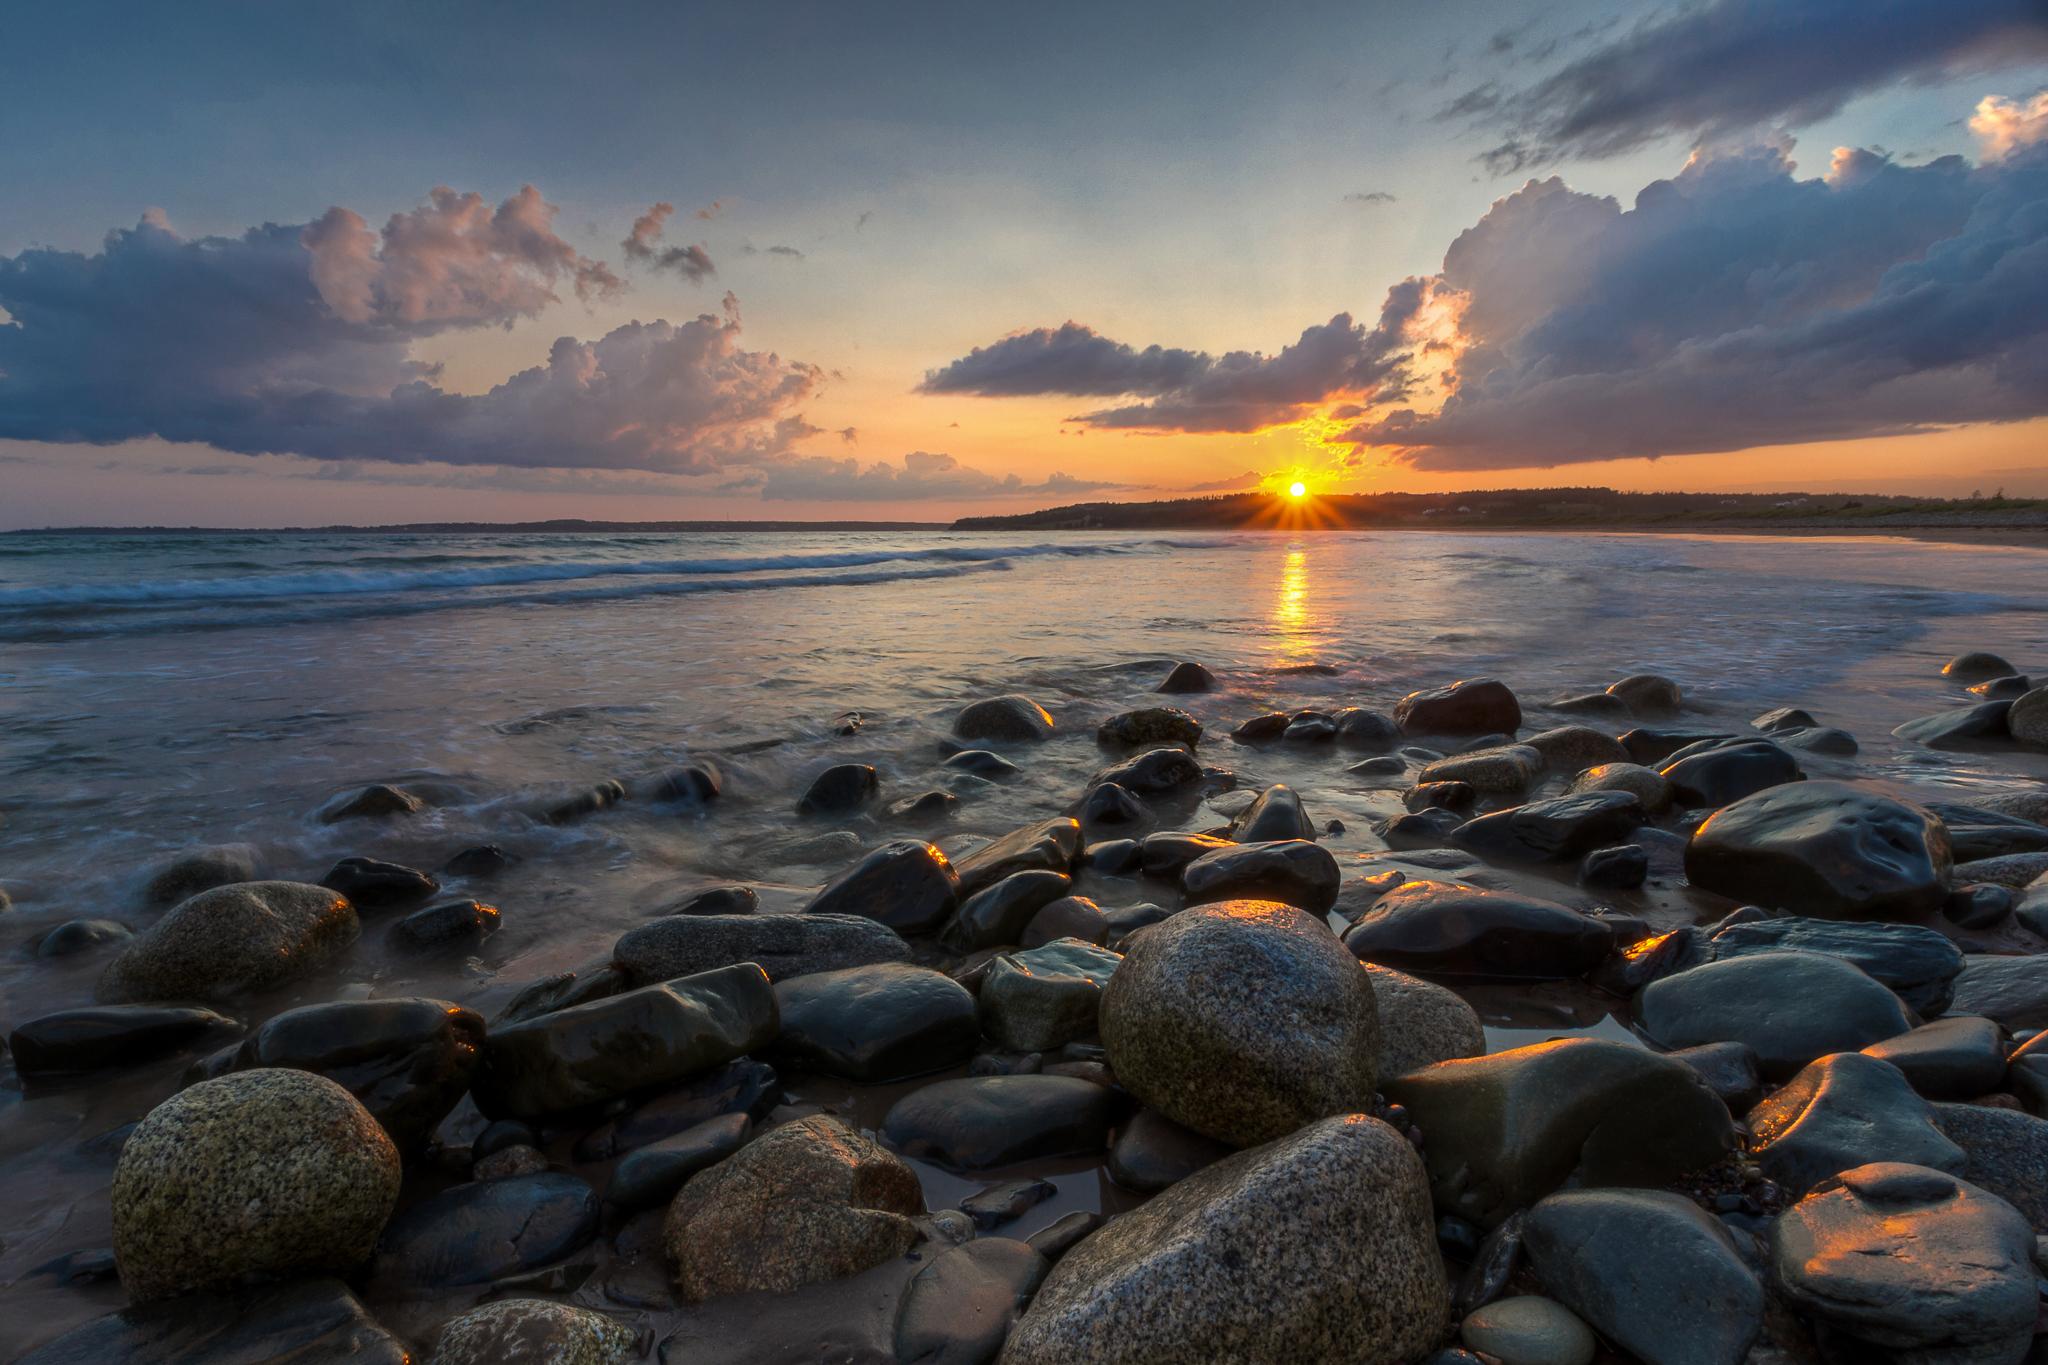 Conrads-Beach-Rocks.jpg